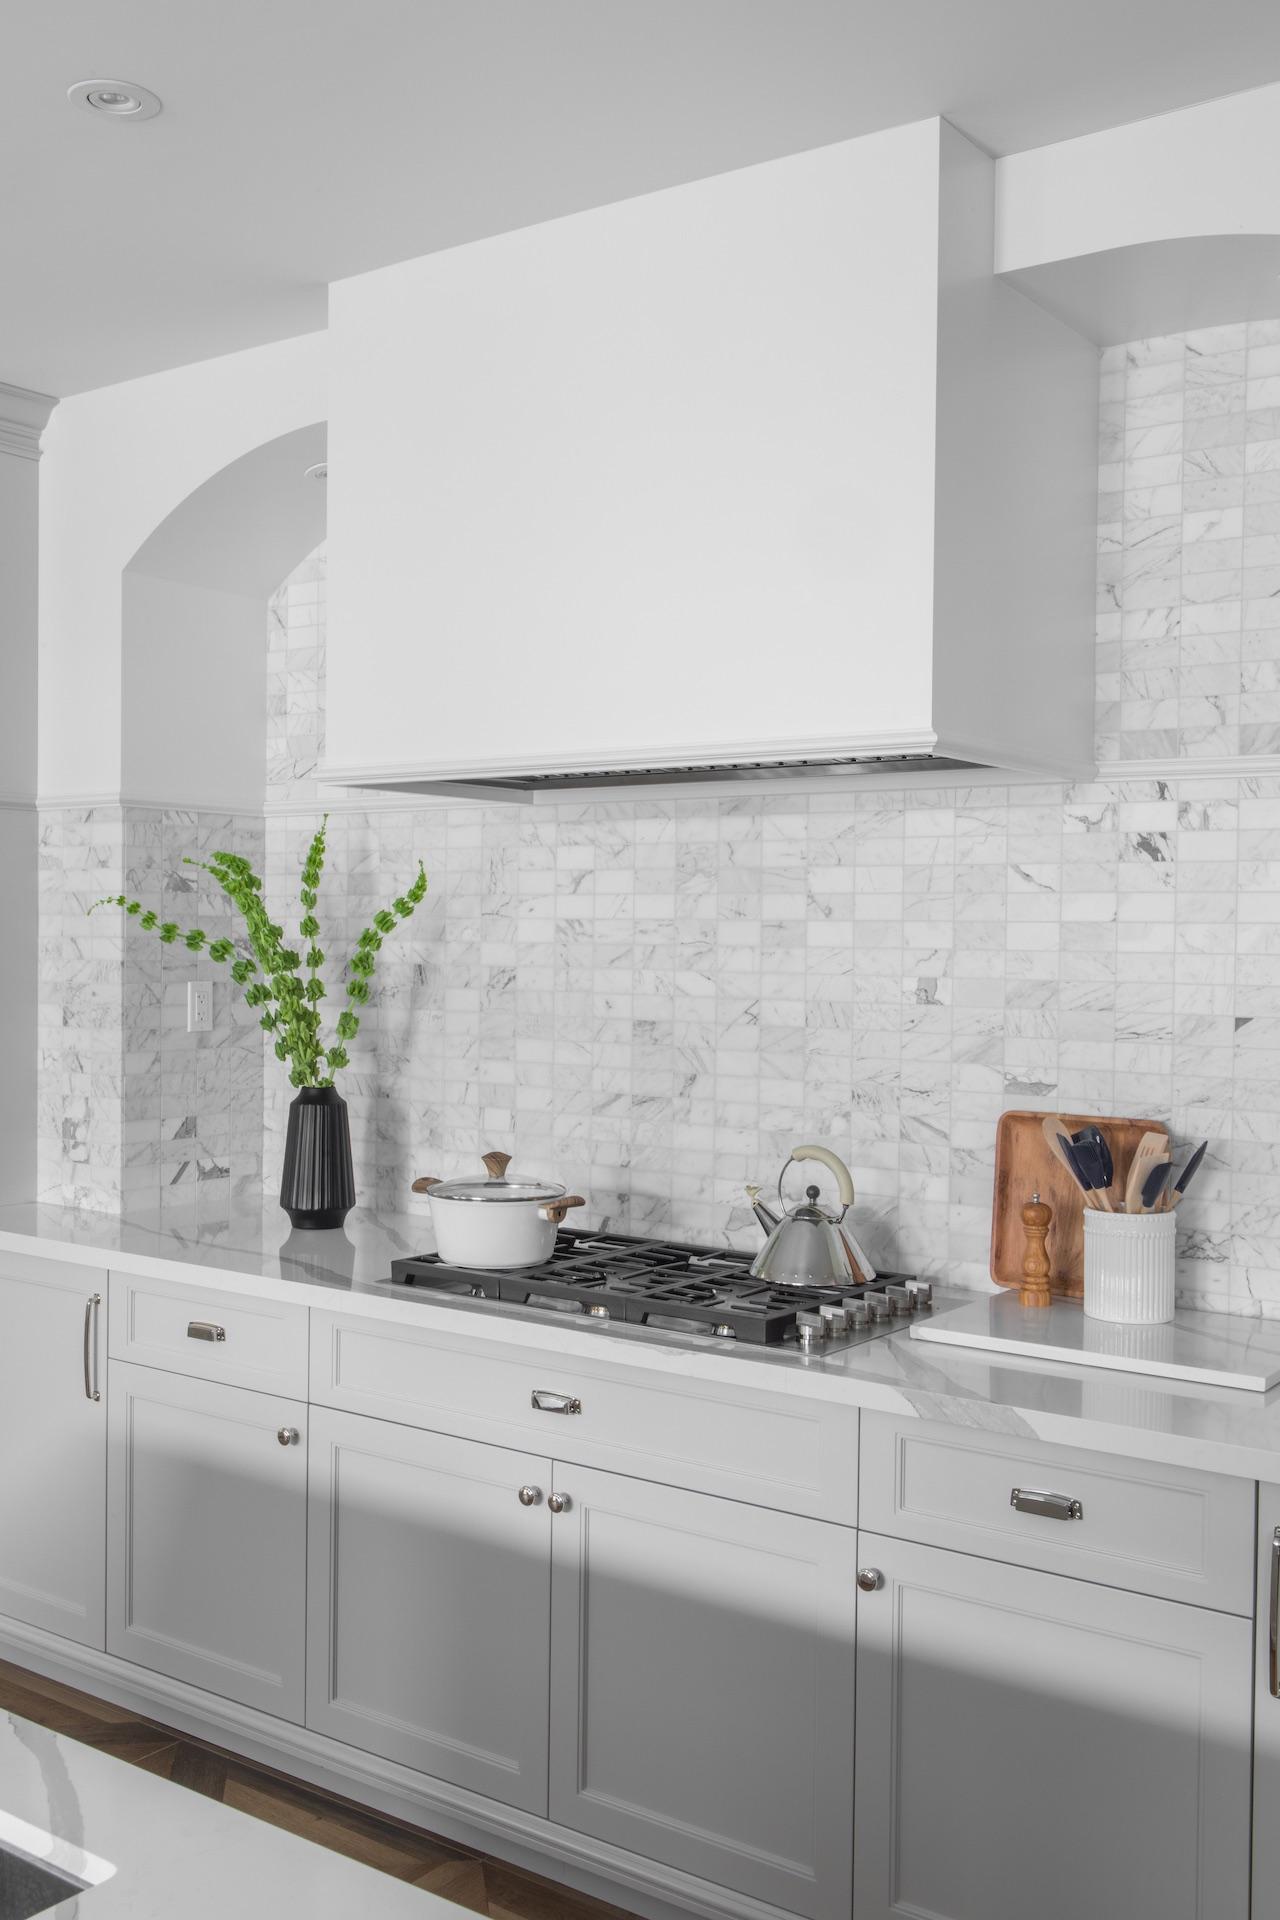 white kitchen with stove